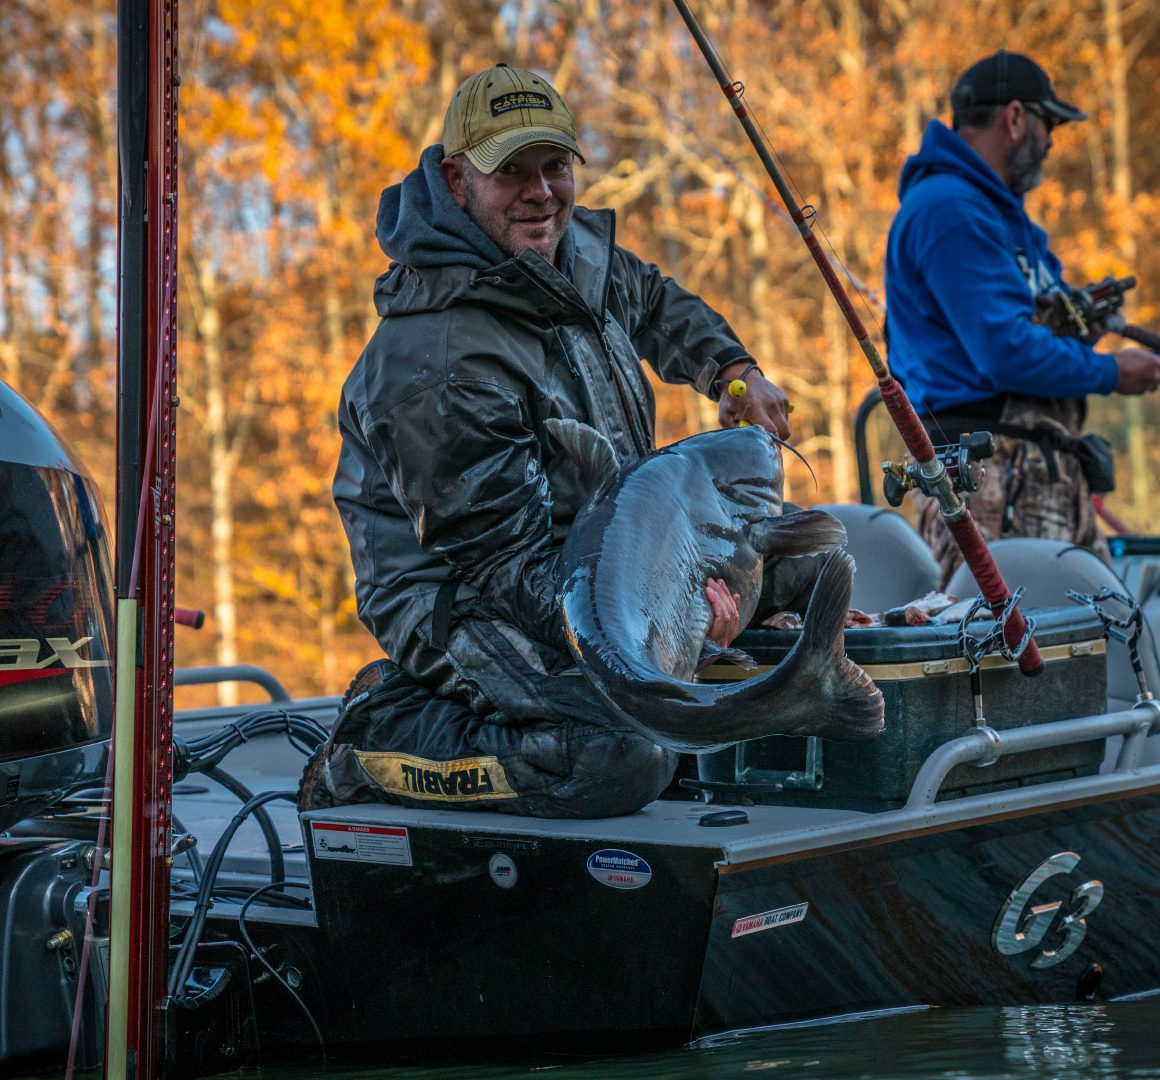 Outdoor Social Media Management - Catfishing